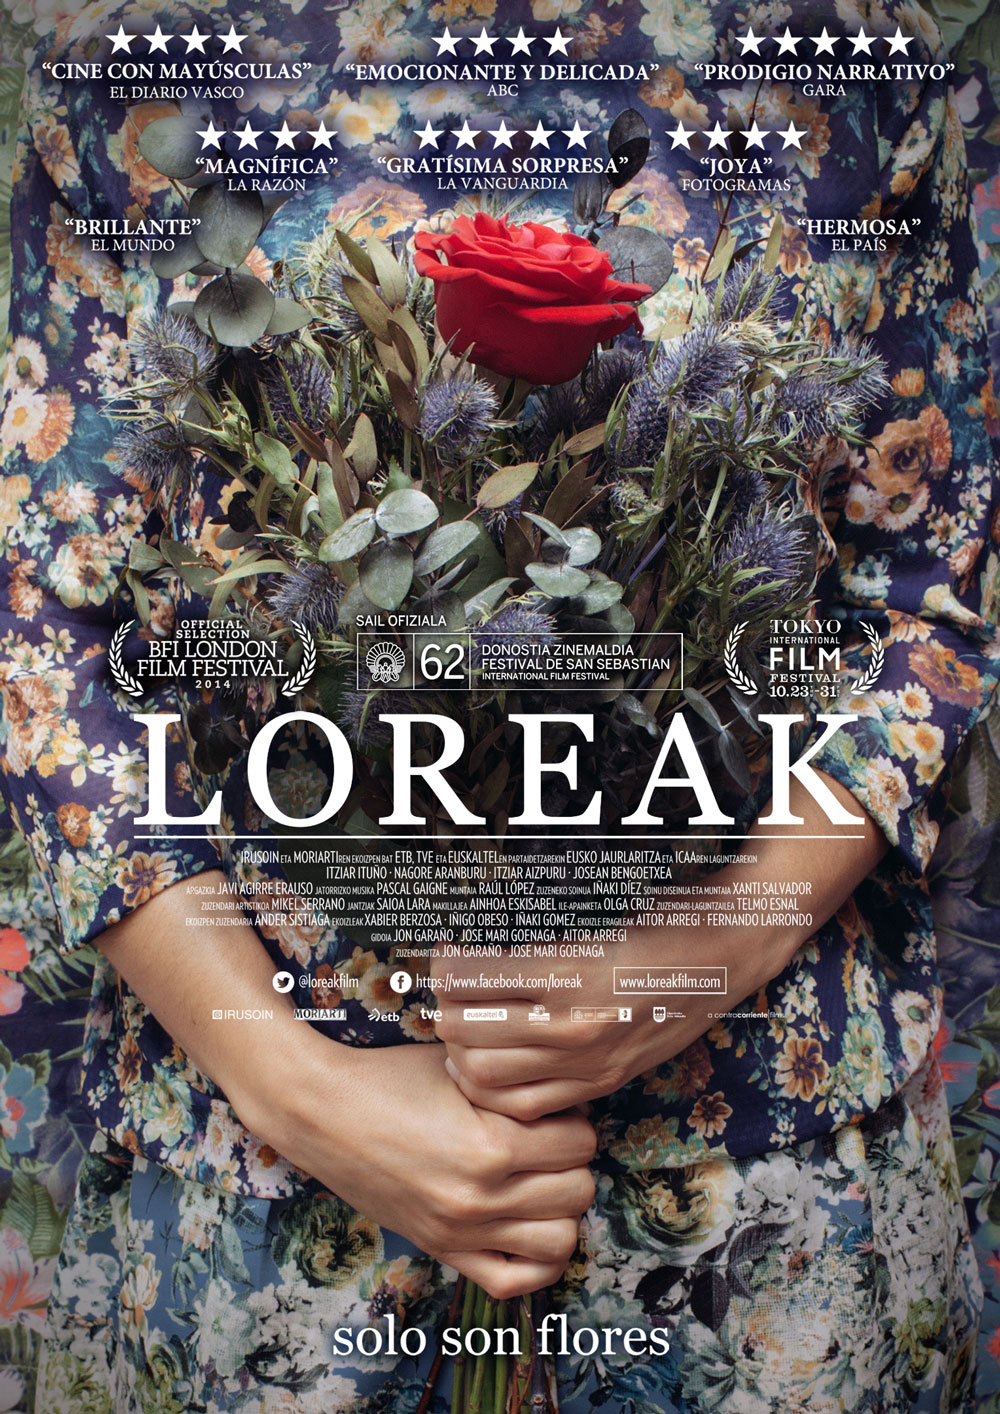 carteles de cine – cartel del film Loreak